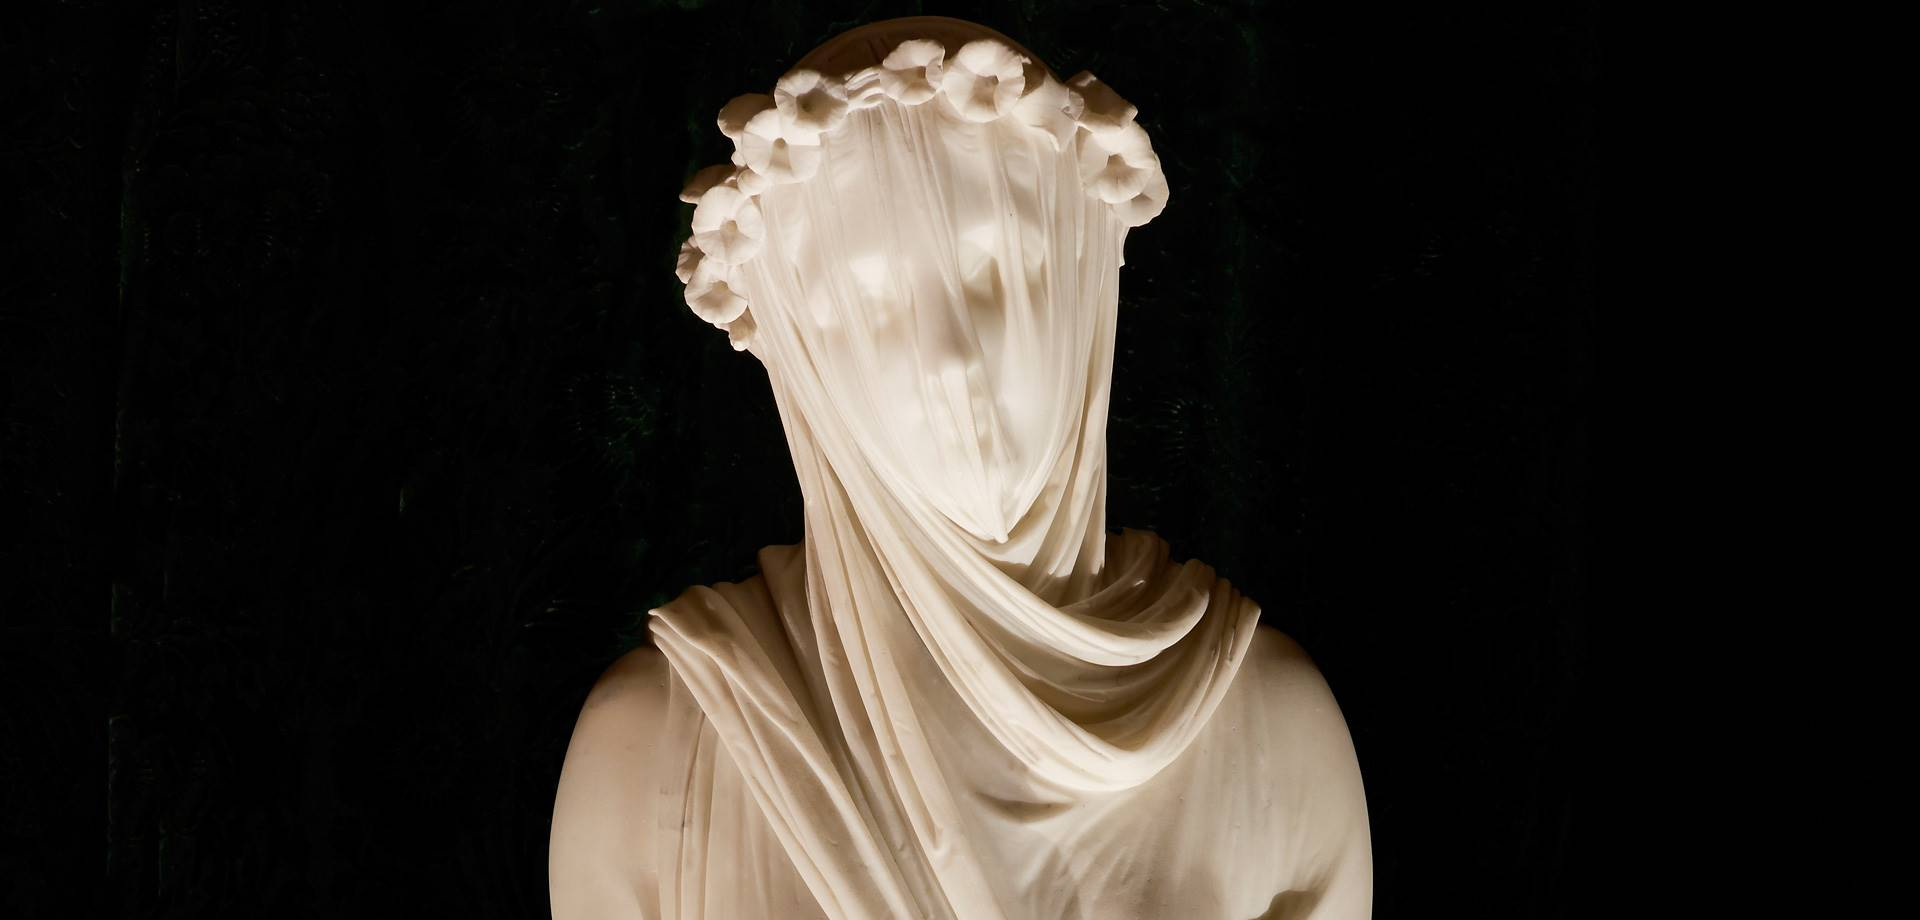 A Veiled Vestal Virgin